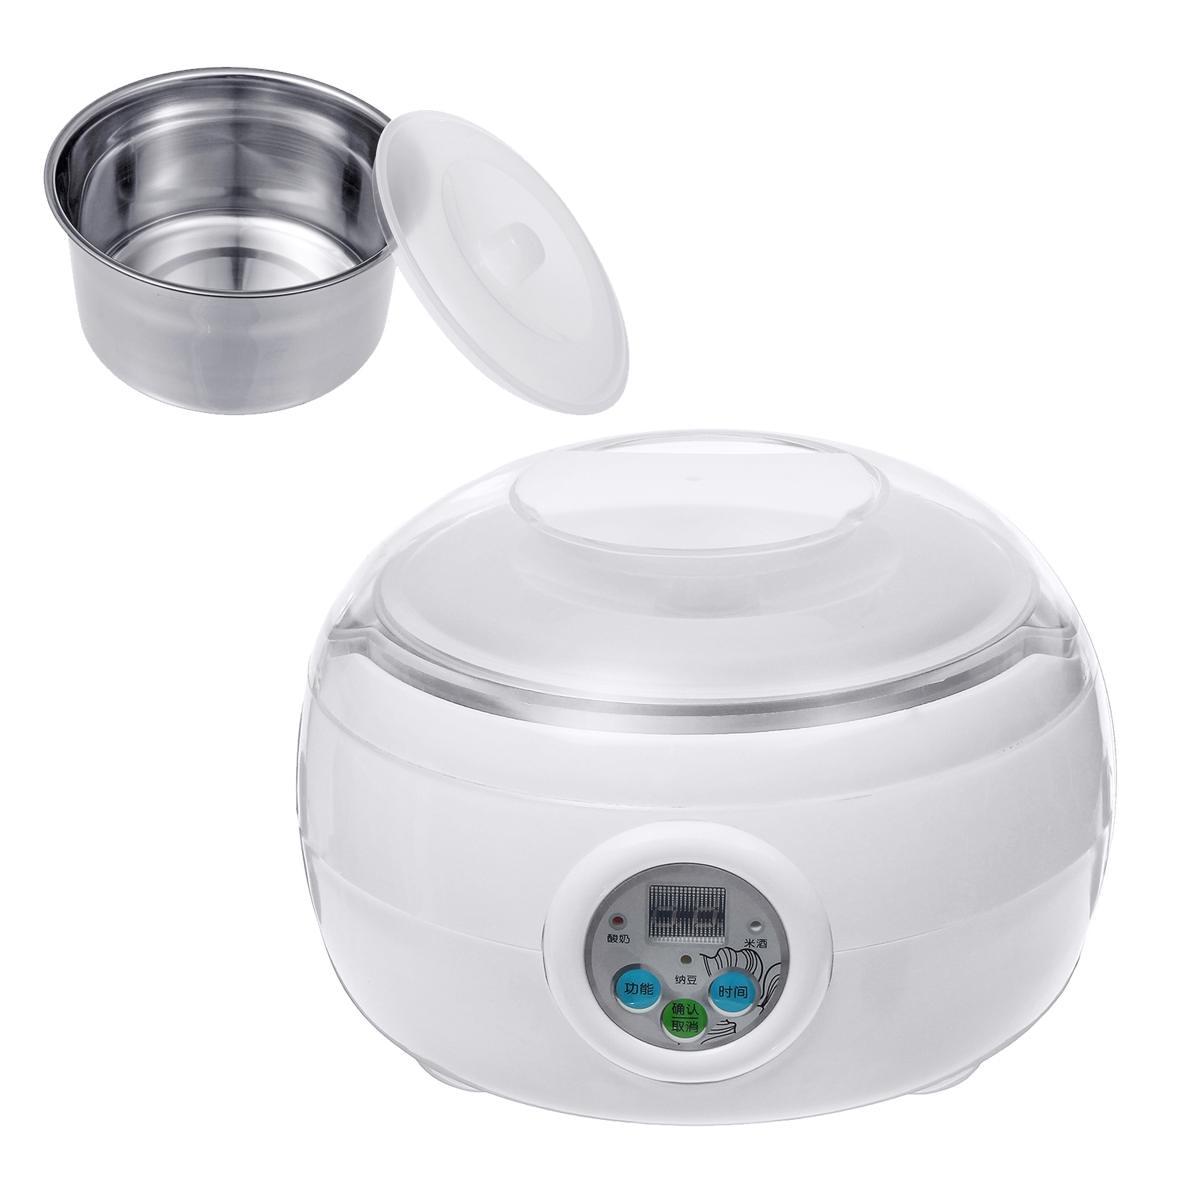 14x21cm:  1.5L 220V 15W White Electric Automatic Yoghurt Maker Rice Wine Natto Cuisine Container Yogurt Maker Kitchen Appliance 14x21cm - Martin's & Co